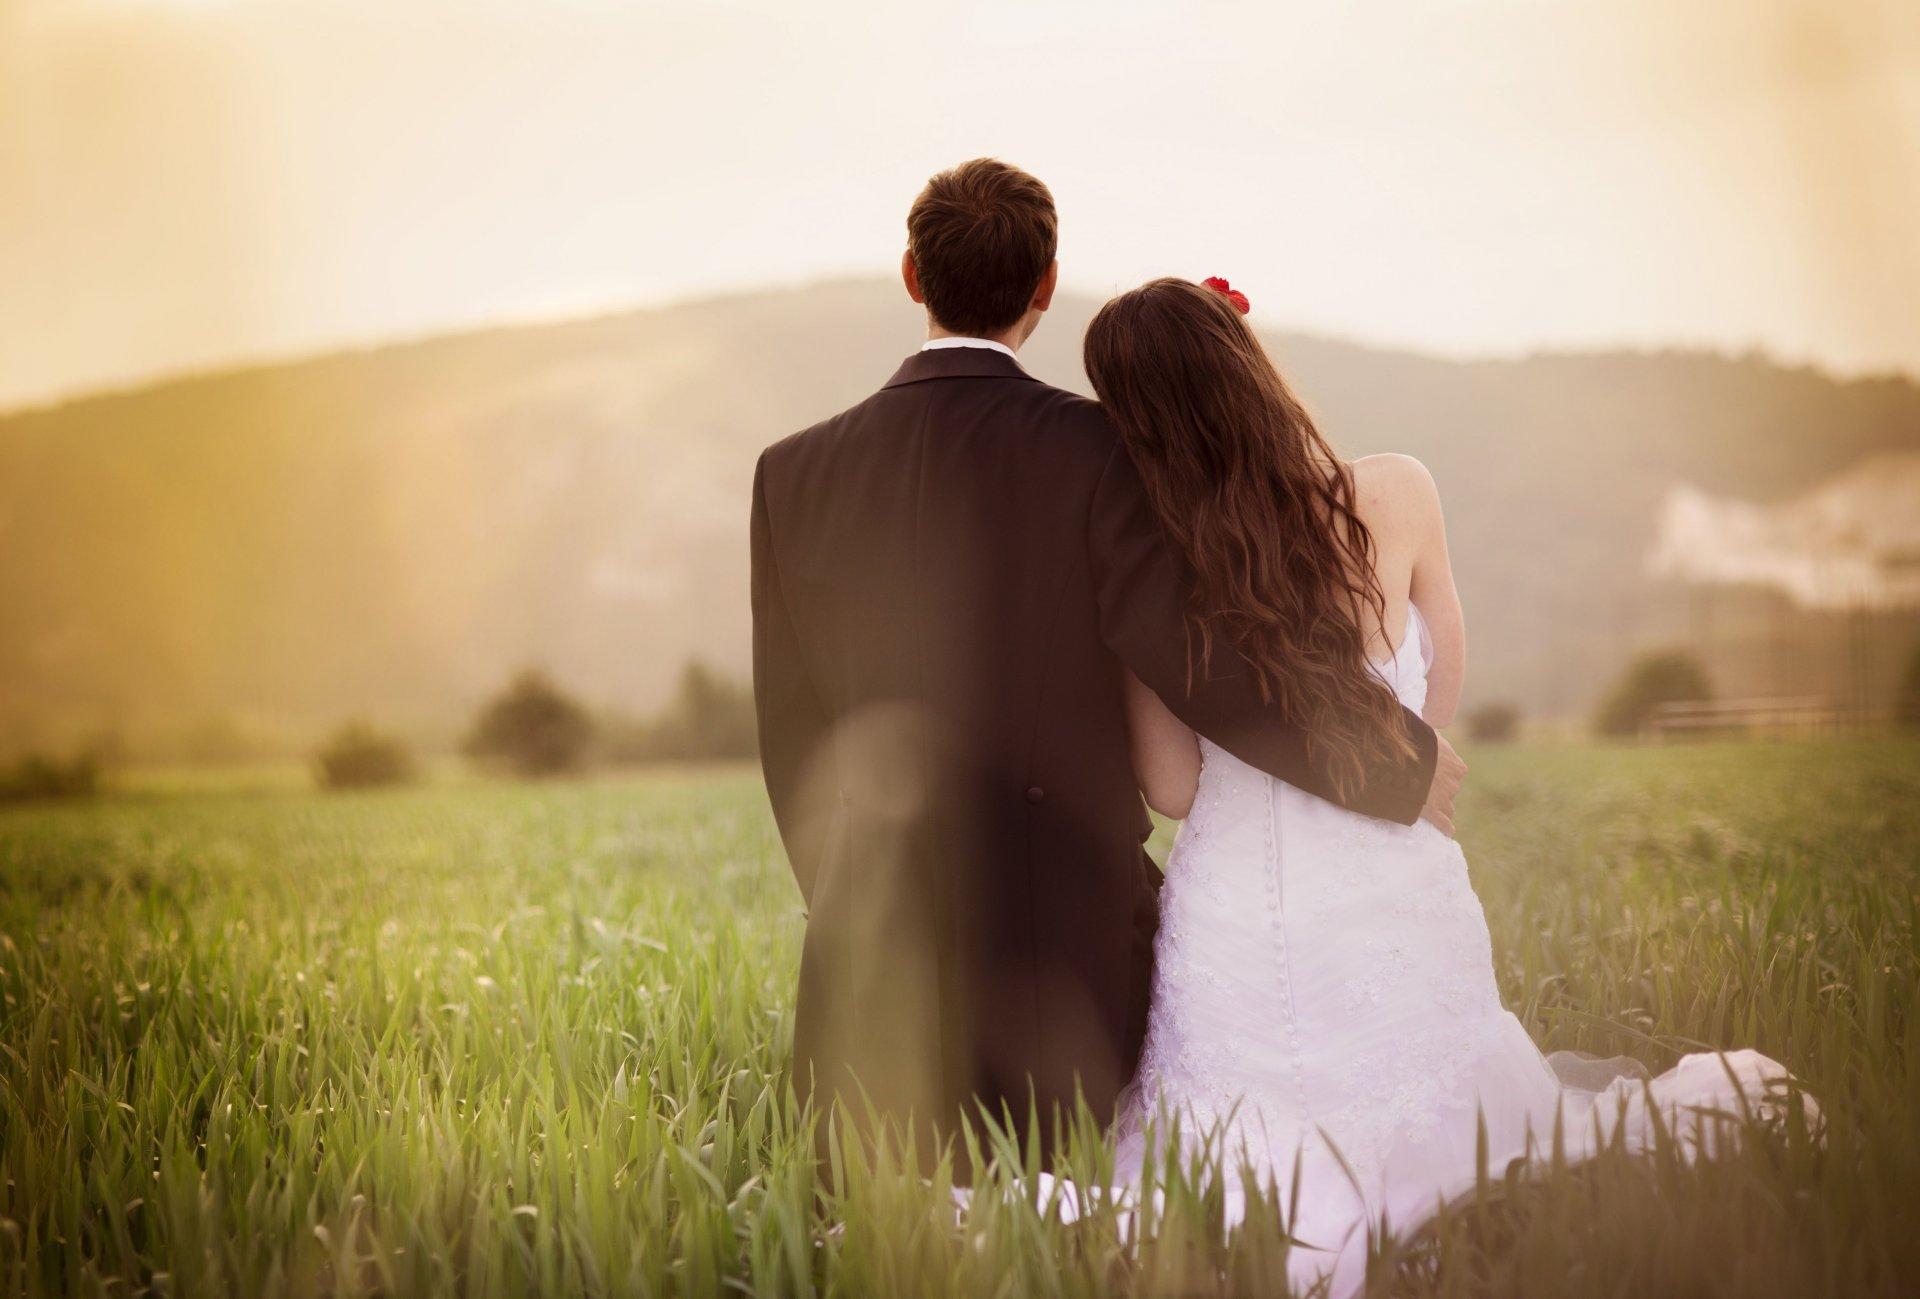 Про, любовно романтические картинки